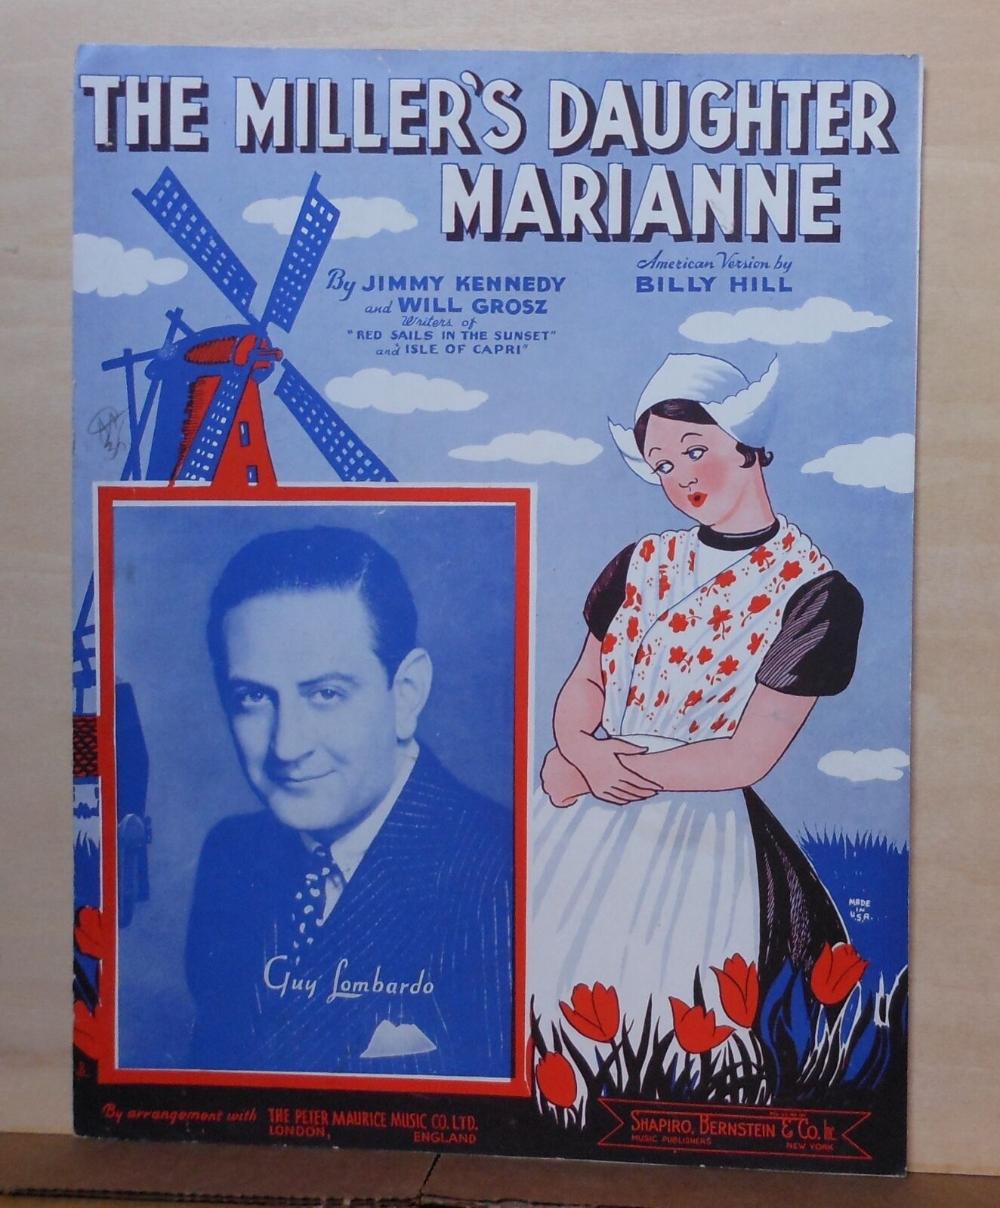 The Miller's Daughter Marianne - 1937 sheet music - Guy Lombardo, Dutch scene | eBay #vintagesheetmusic